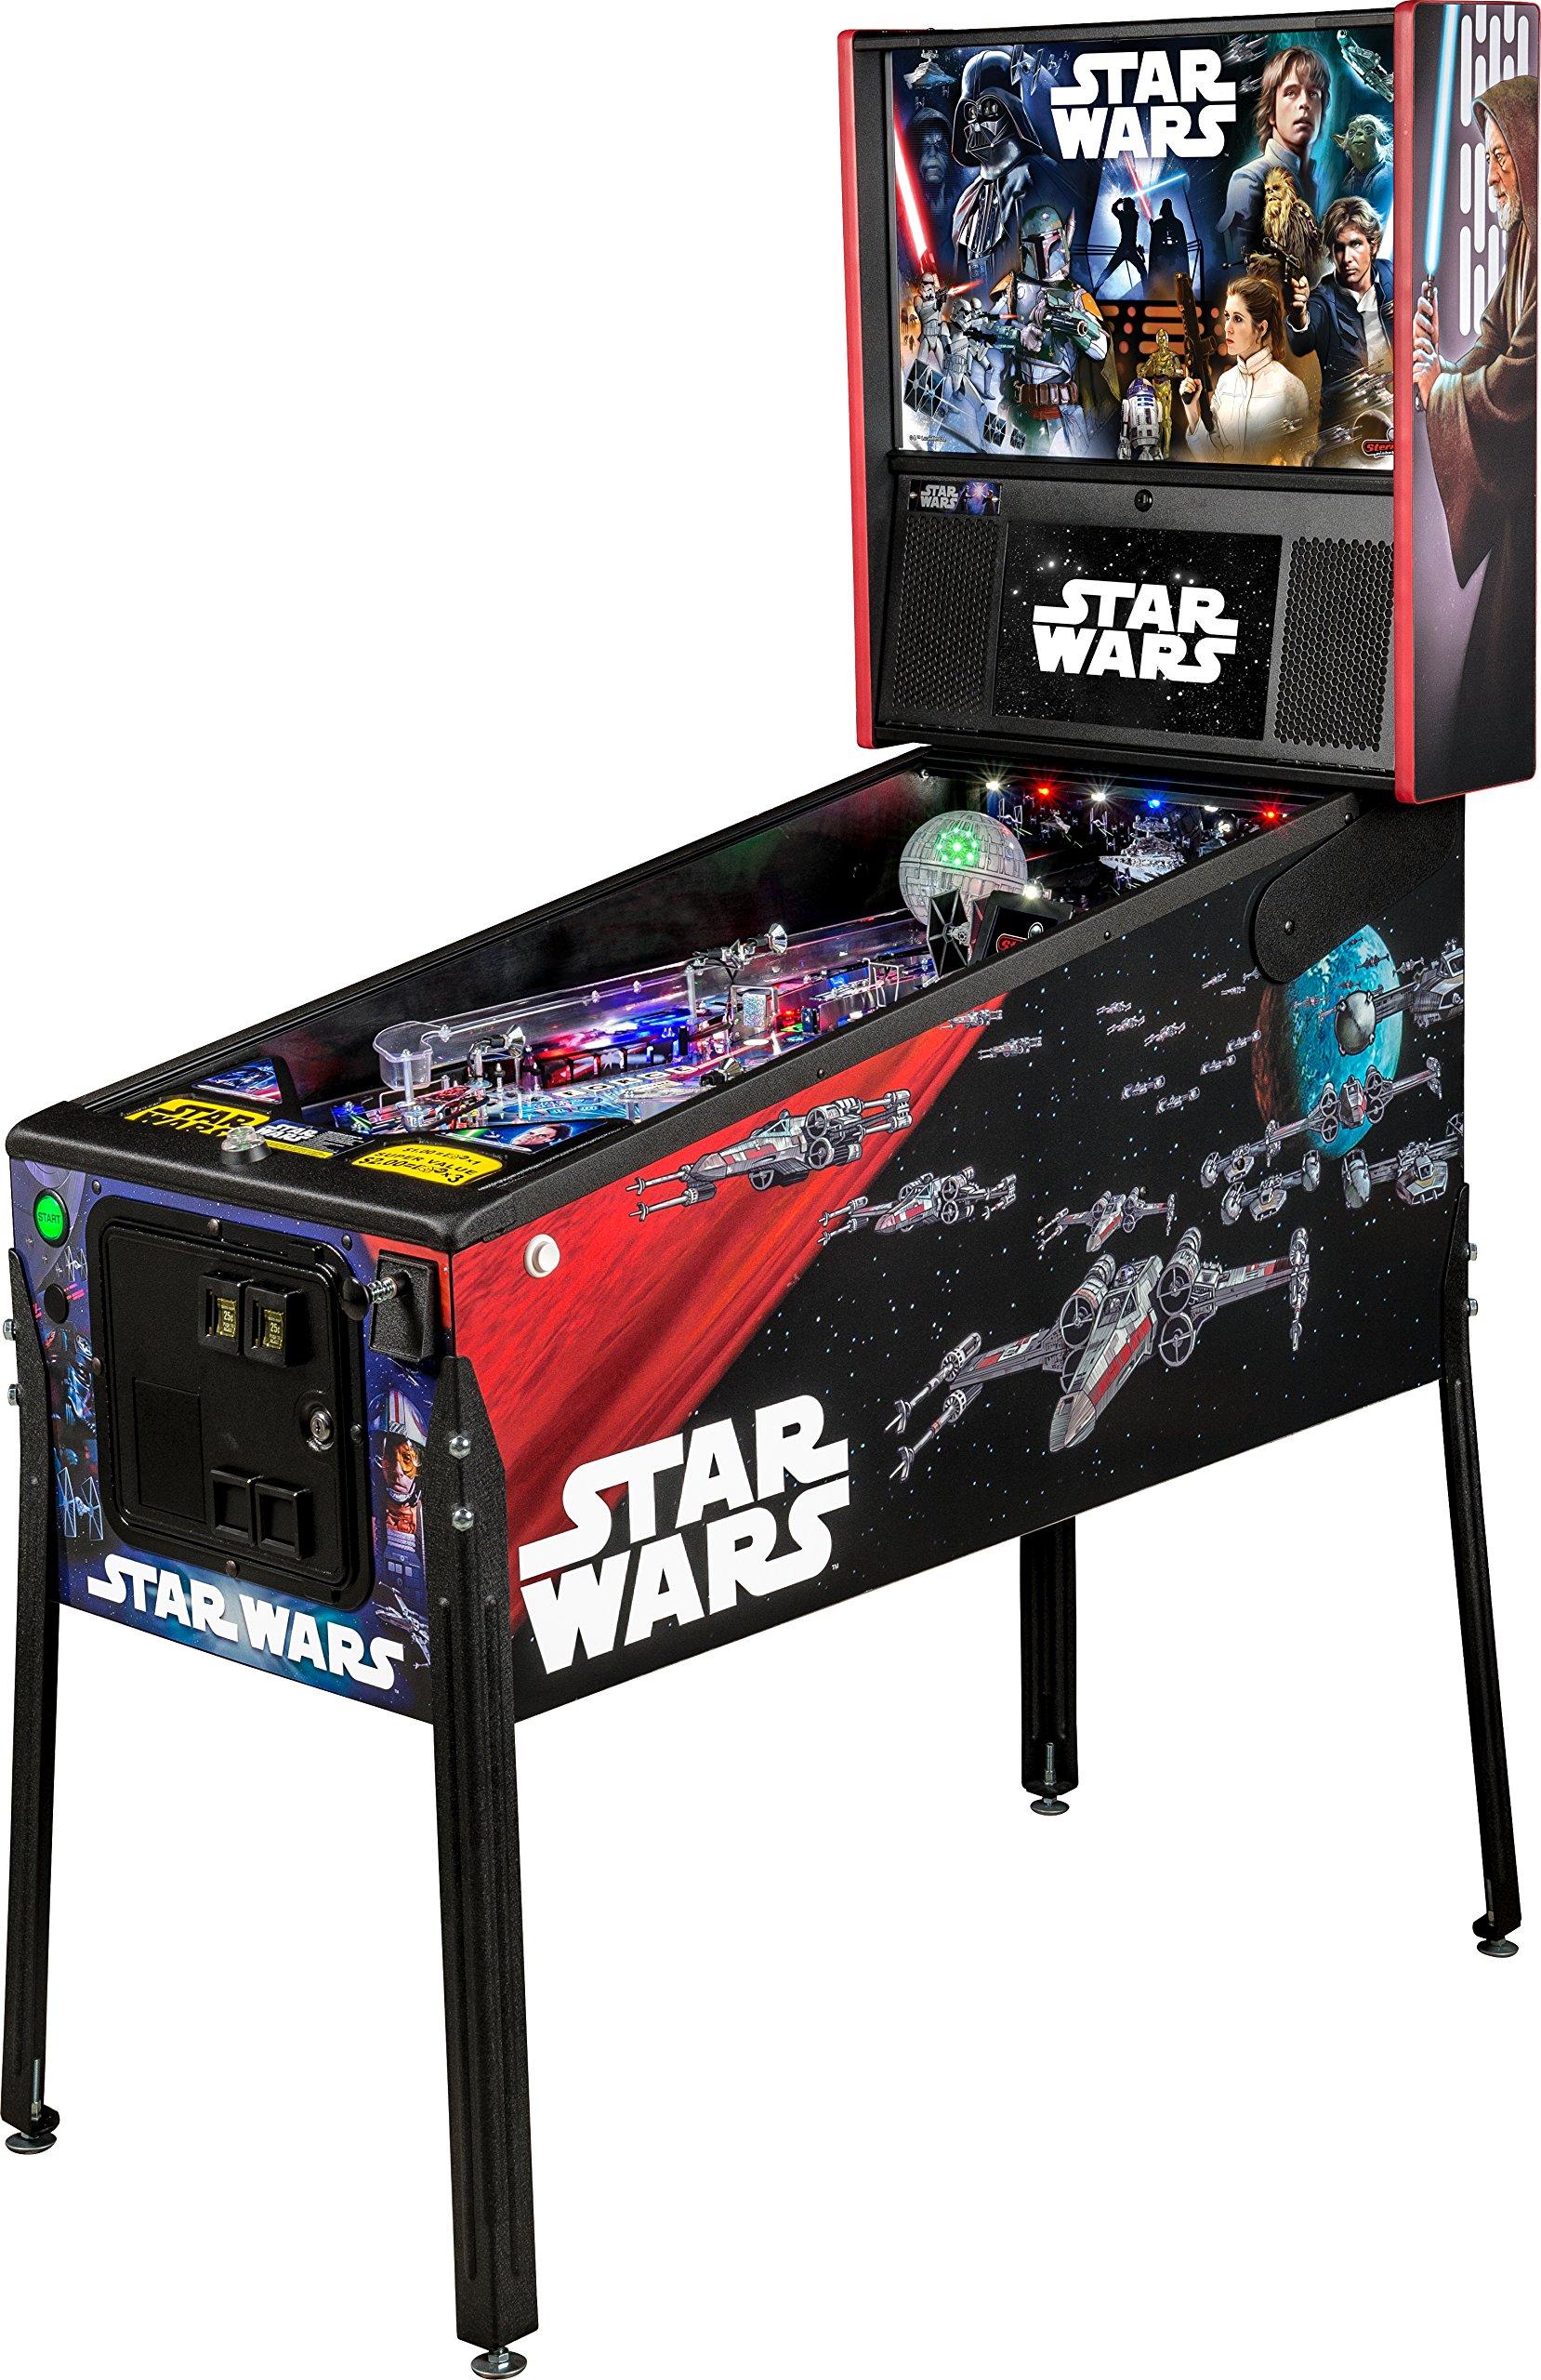 Stern Pinball Star Wars Arcade Pinball Machine, Pro Edition by Stern Pinball